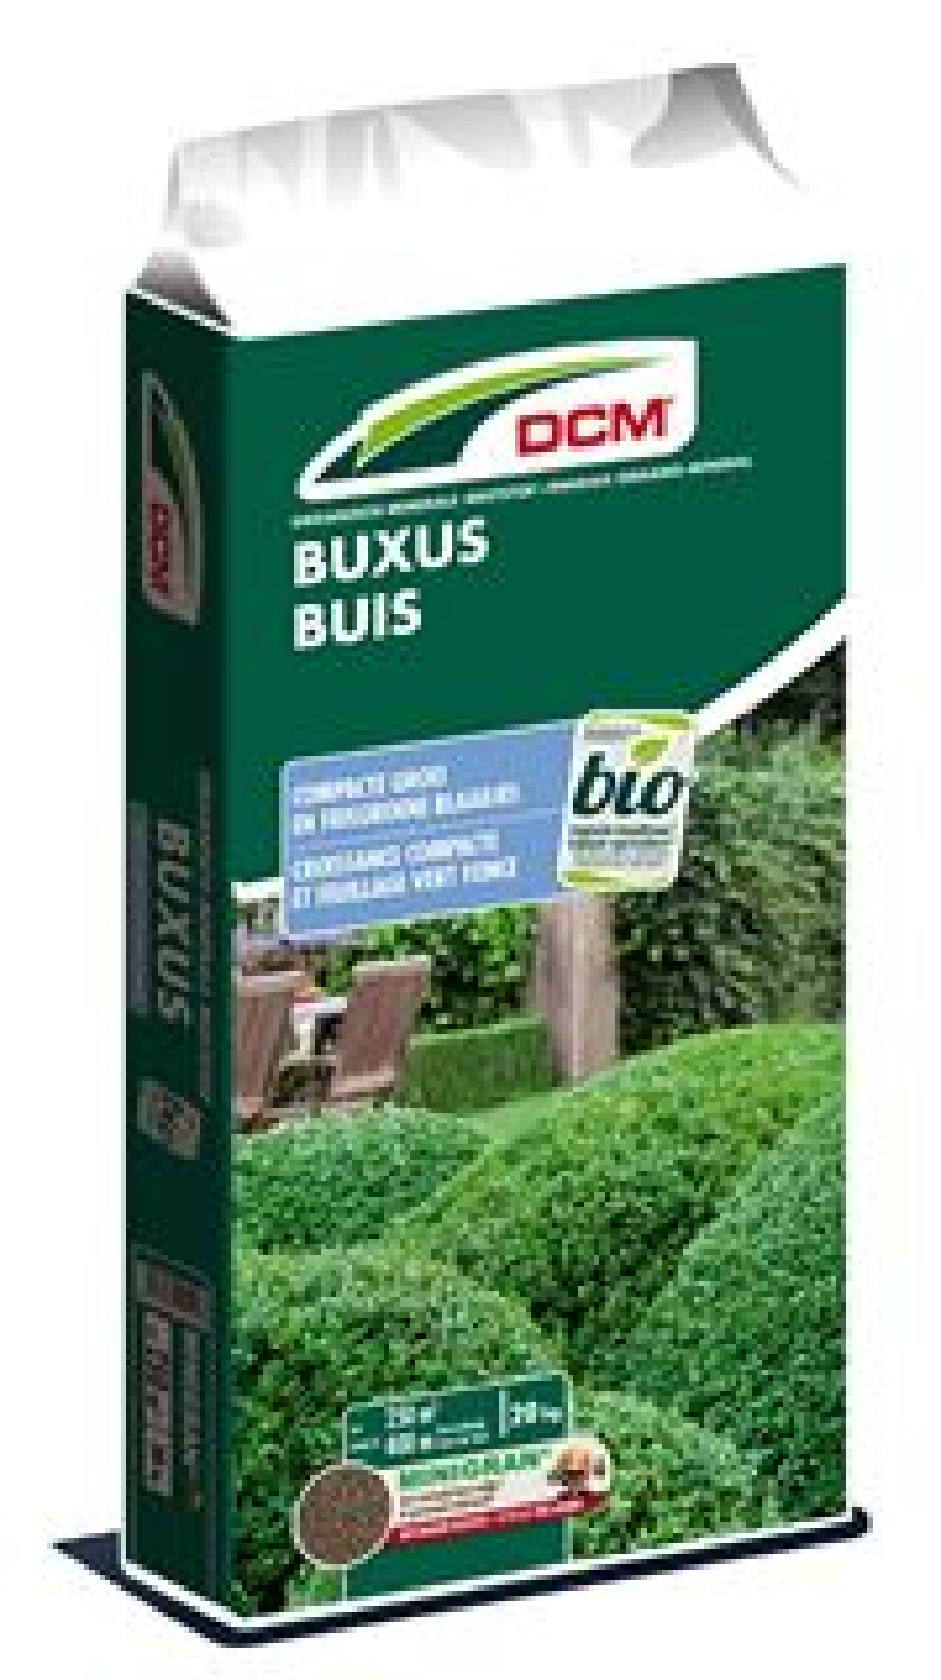 Meststof-buxus-20kg-Bio-NPK-6-3-6-2MgO-6Ca